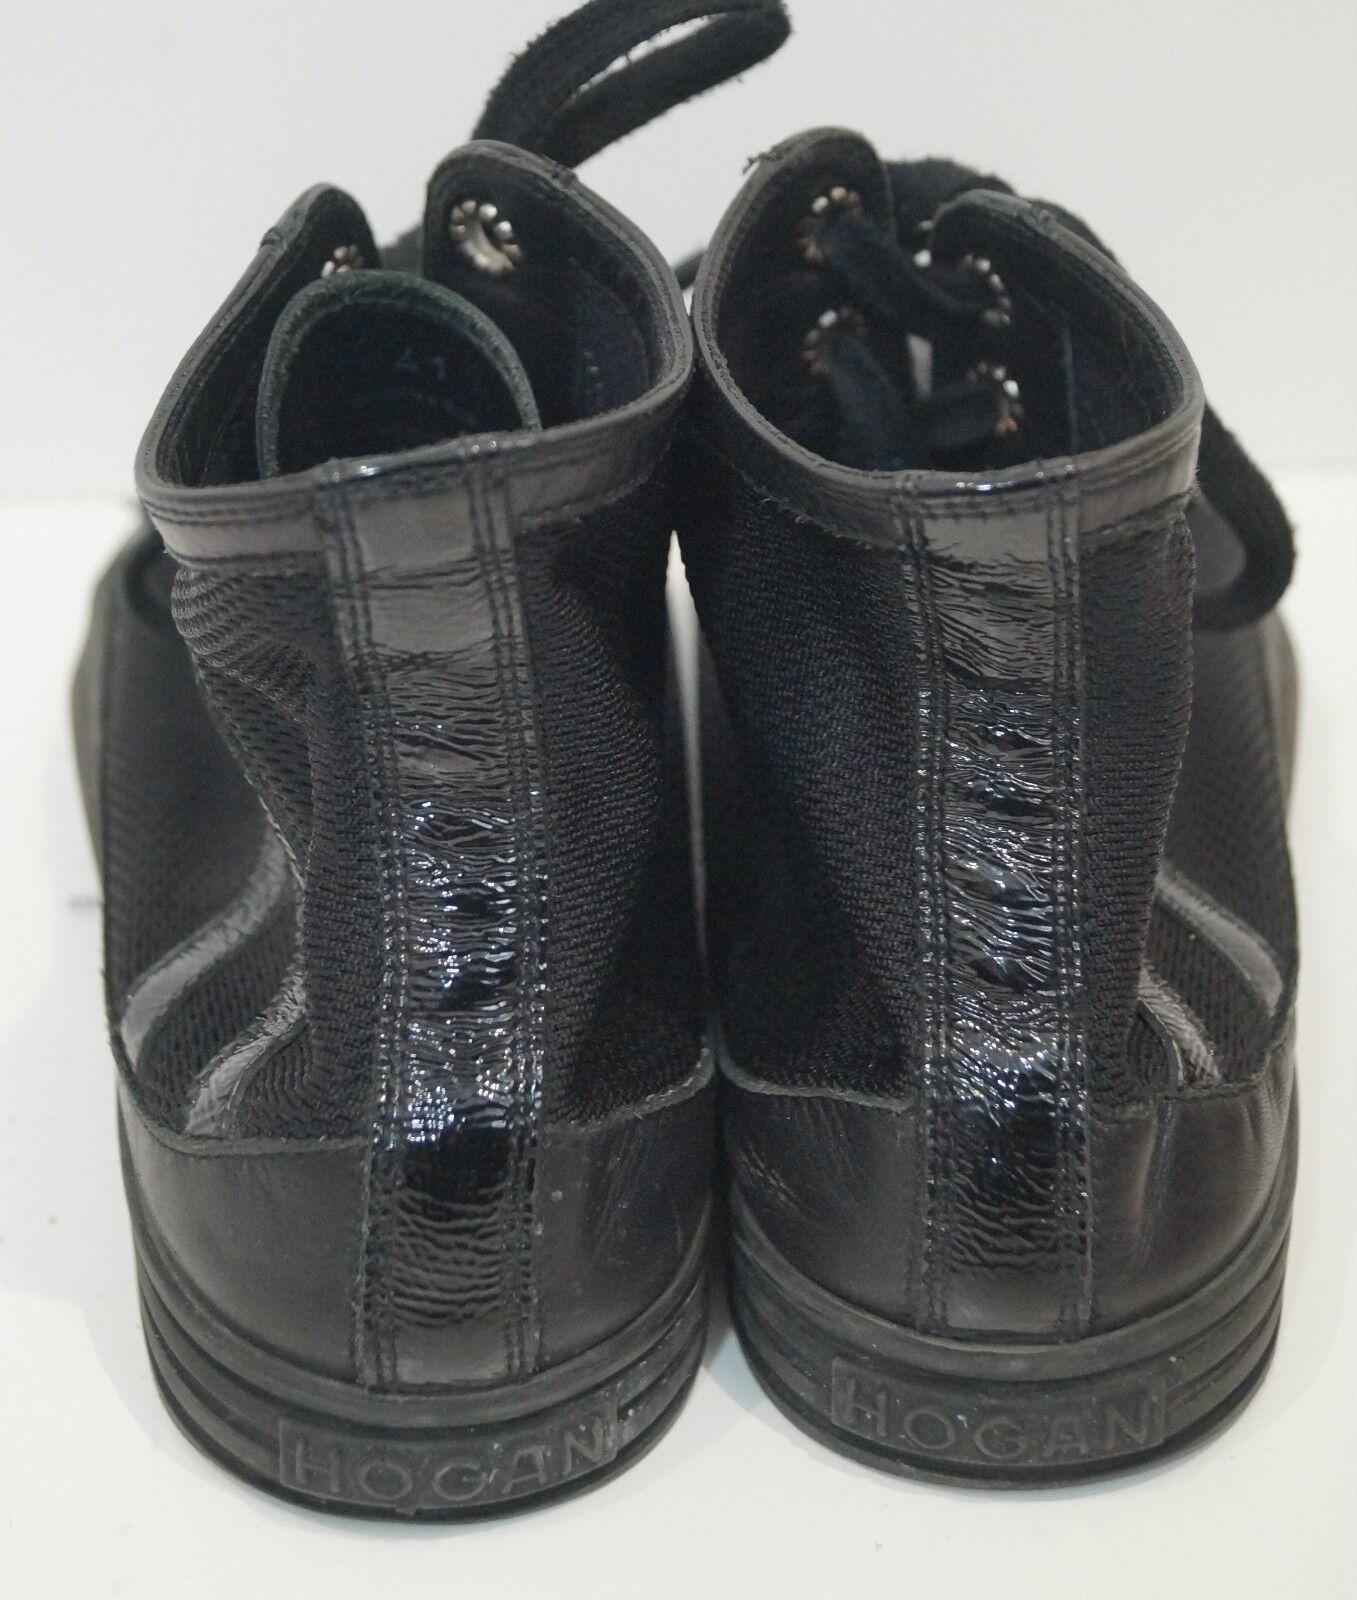 HOGAN Women's Black Leather Patent Patent Patent & Fabric Branded High Tops Sneakers UK8 EU41 4c99b1